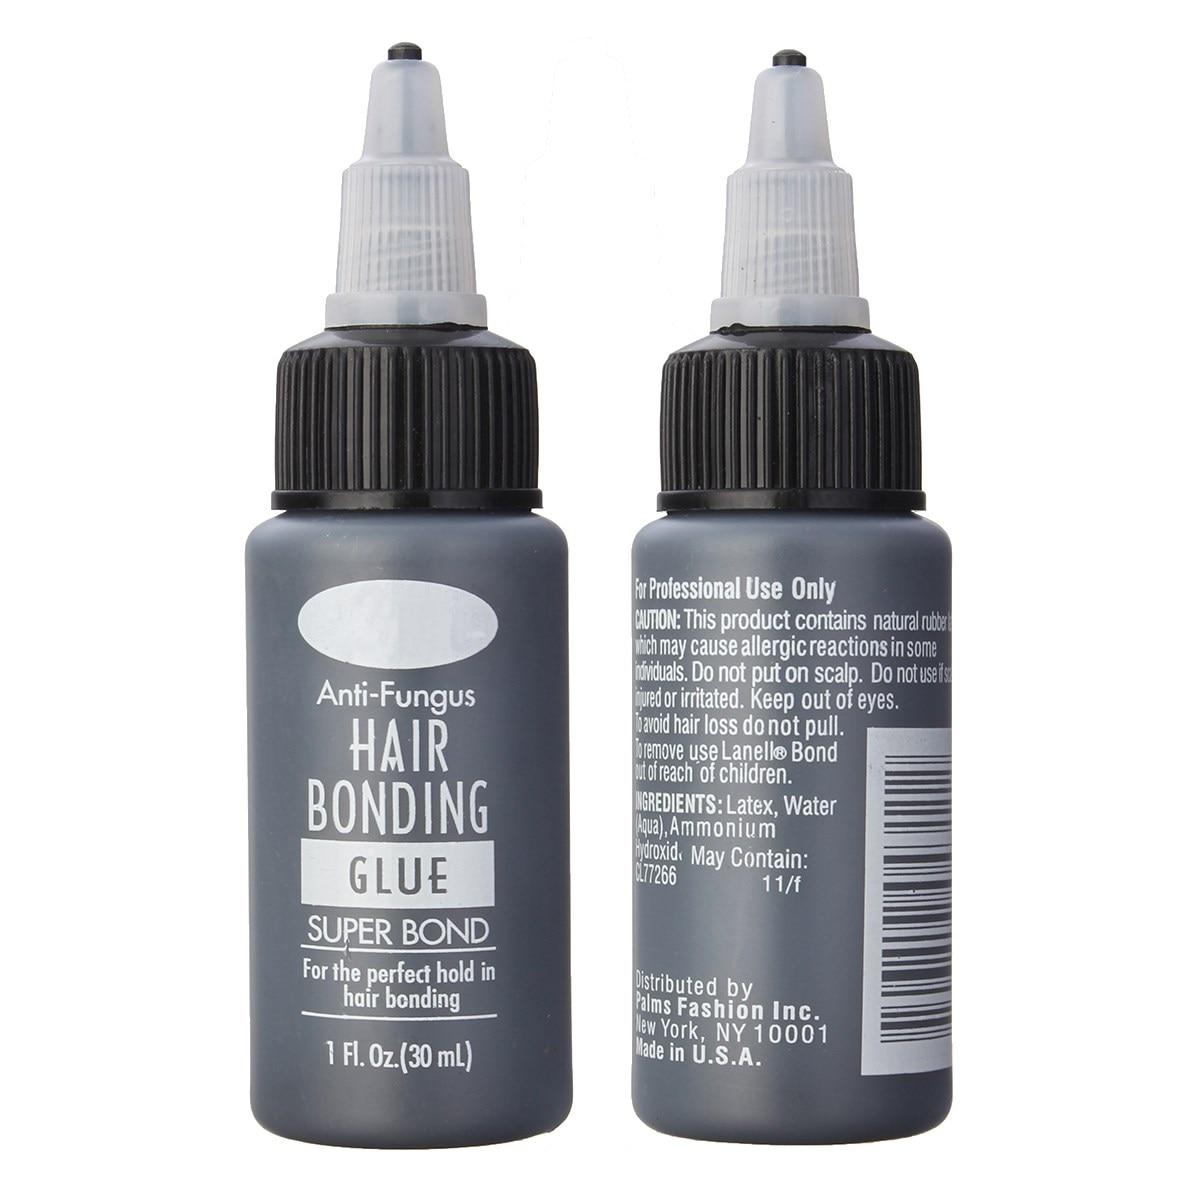 1Bottle 1Floz Hair Bonding Glue Super Bonding Liquid Glue For Weaving Weft Wig Hair Extensions Tools Professional Salon Use